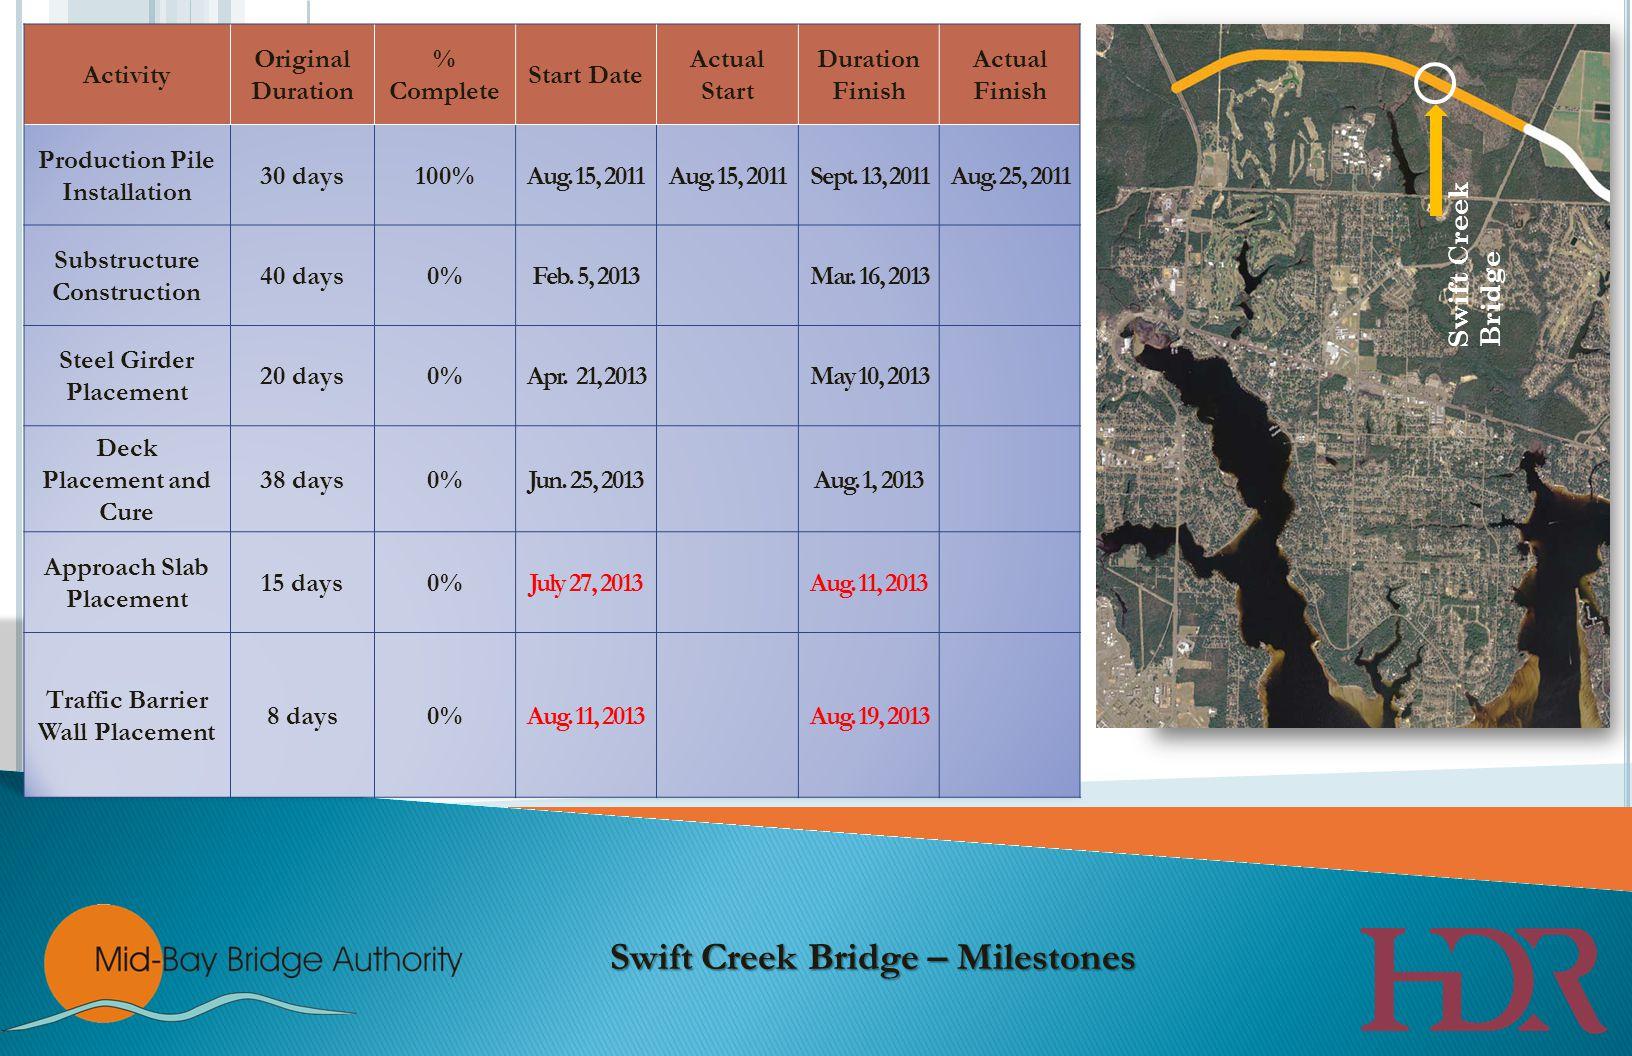 Range Road Bridge Swift Creek Bridge – Milestones Swift Creek Bridge